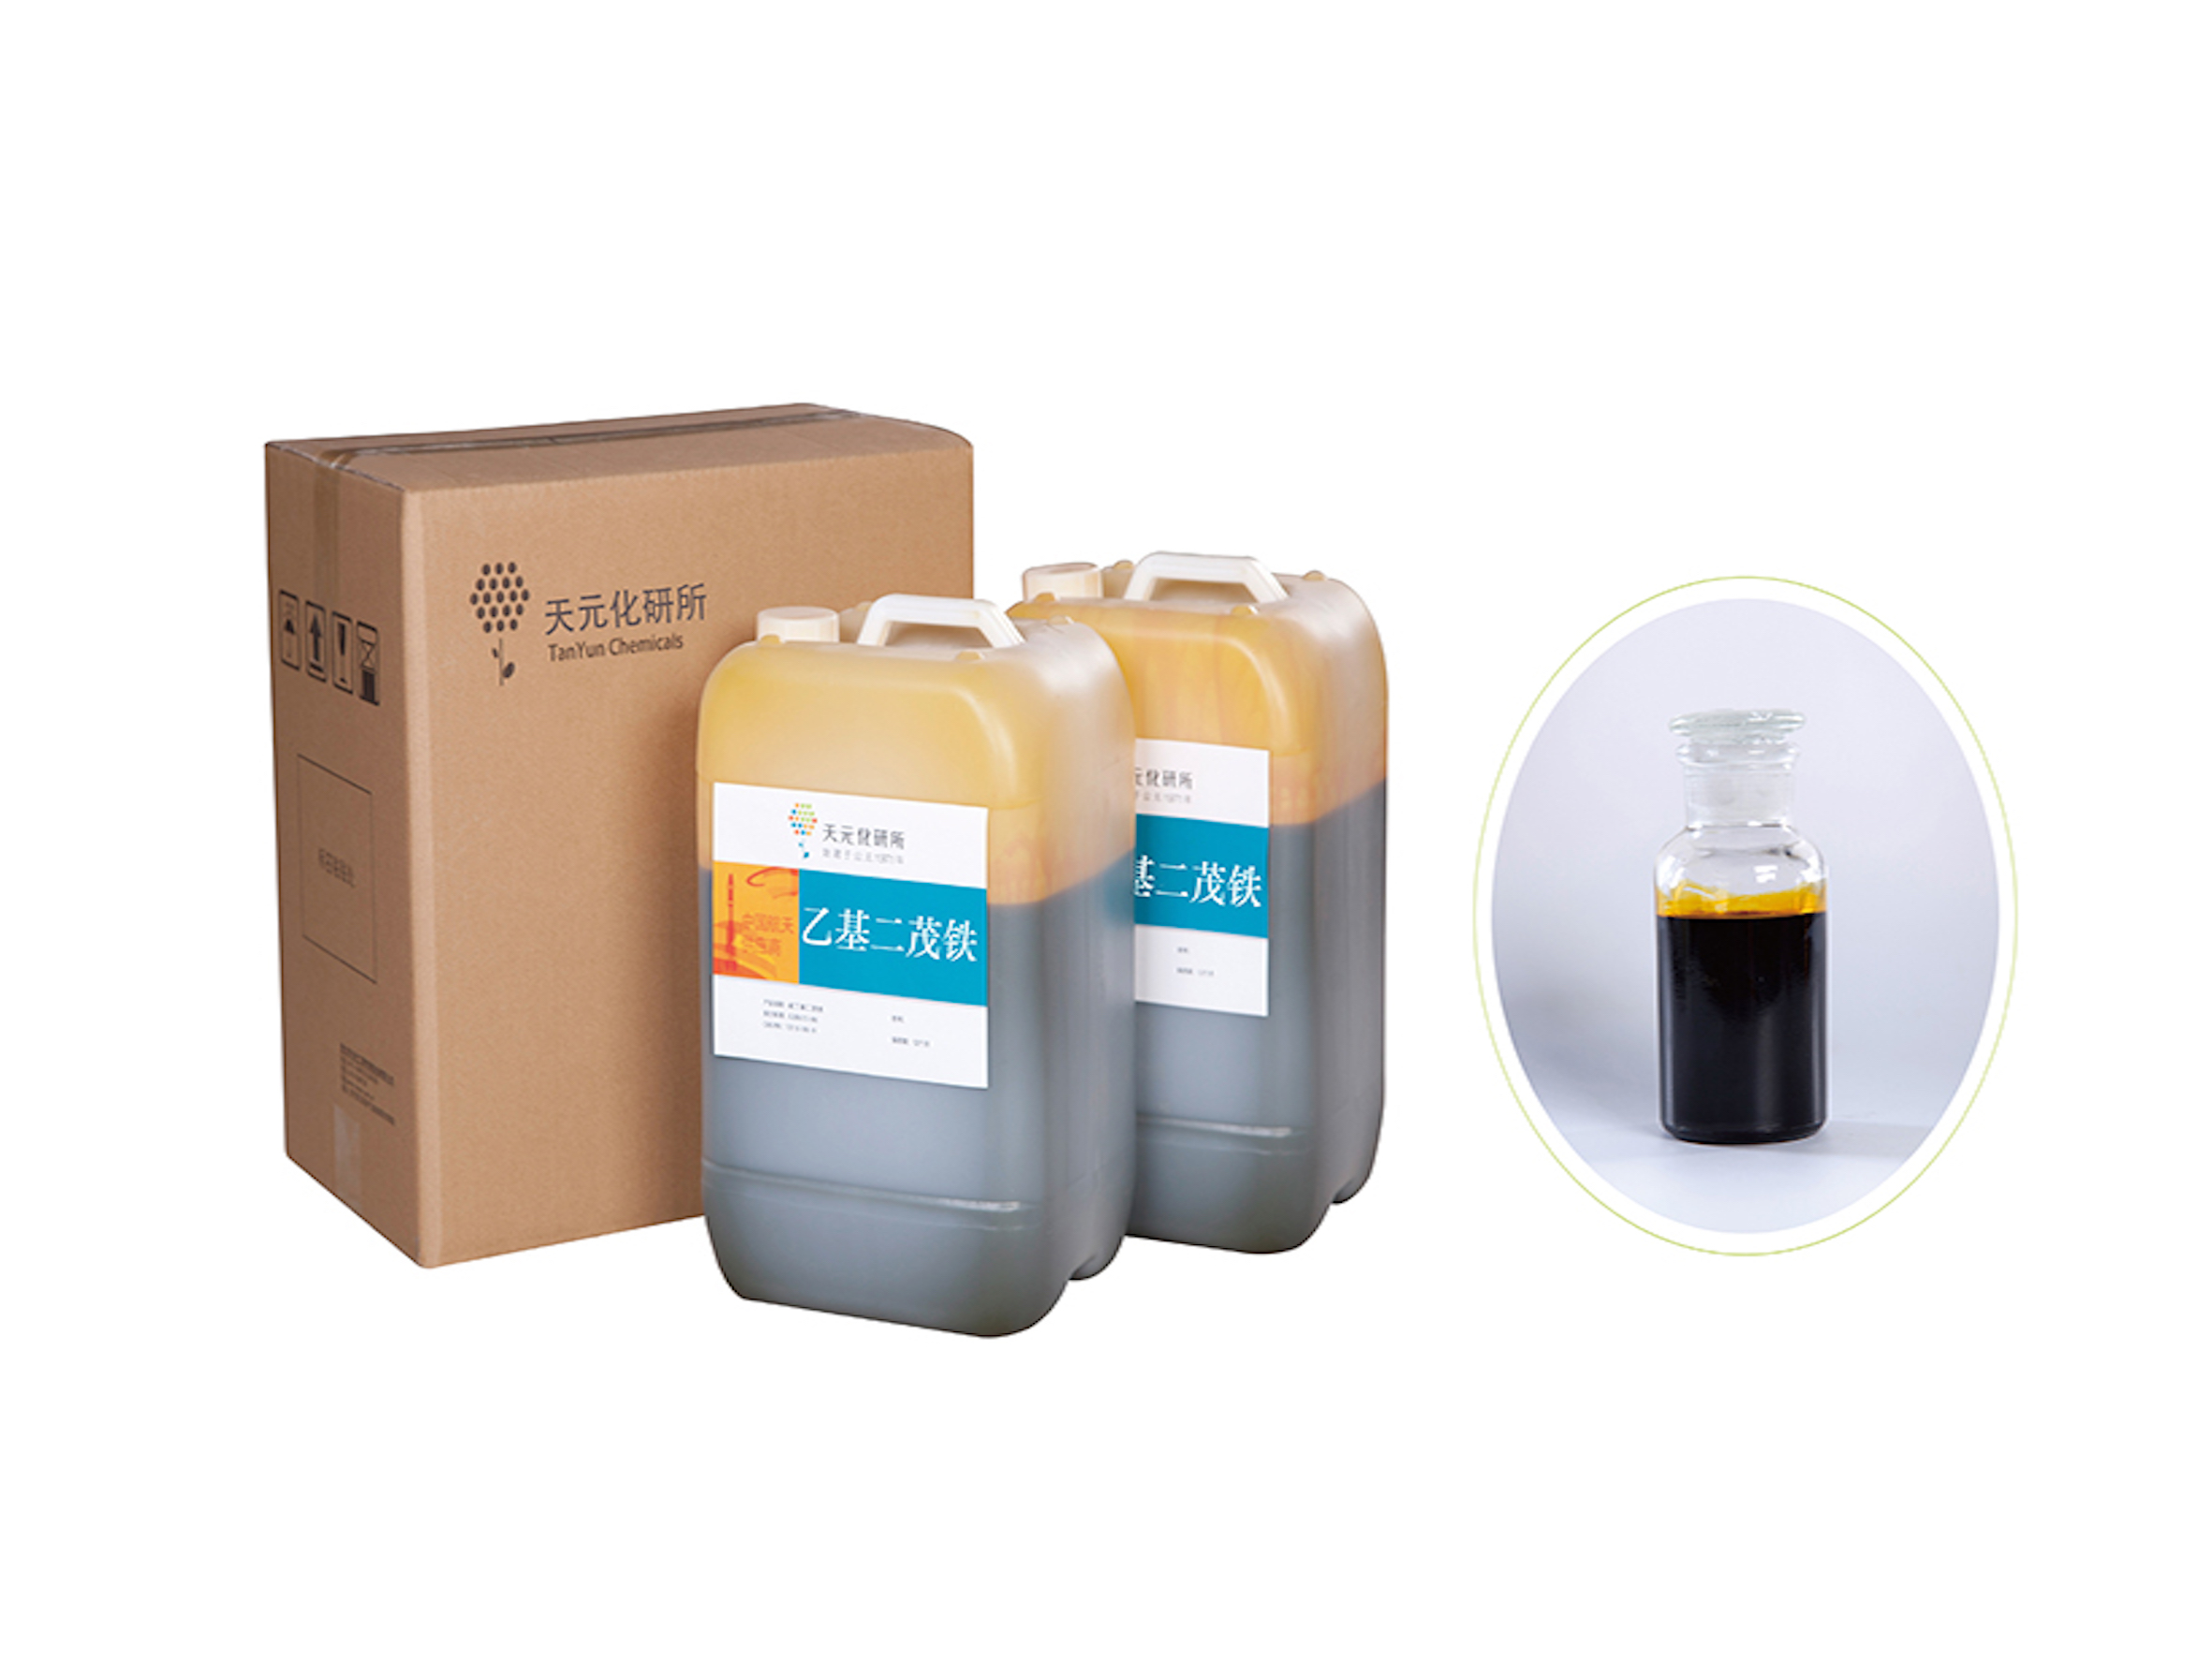 2,2'-Bis(ethylferrocenyl)propane /Catocene (CAS :69279-97-6/37206-42-1)